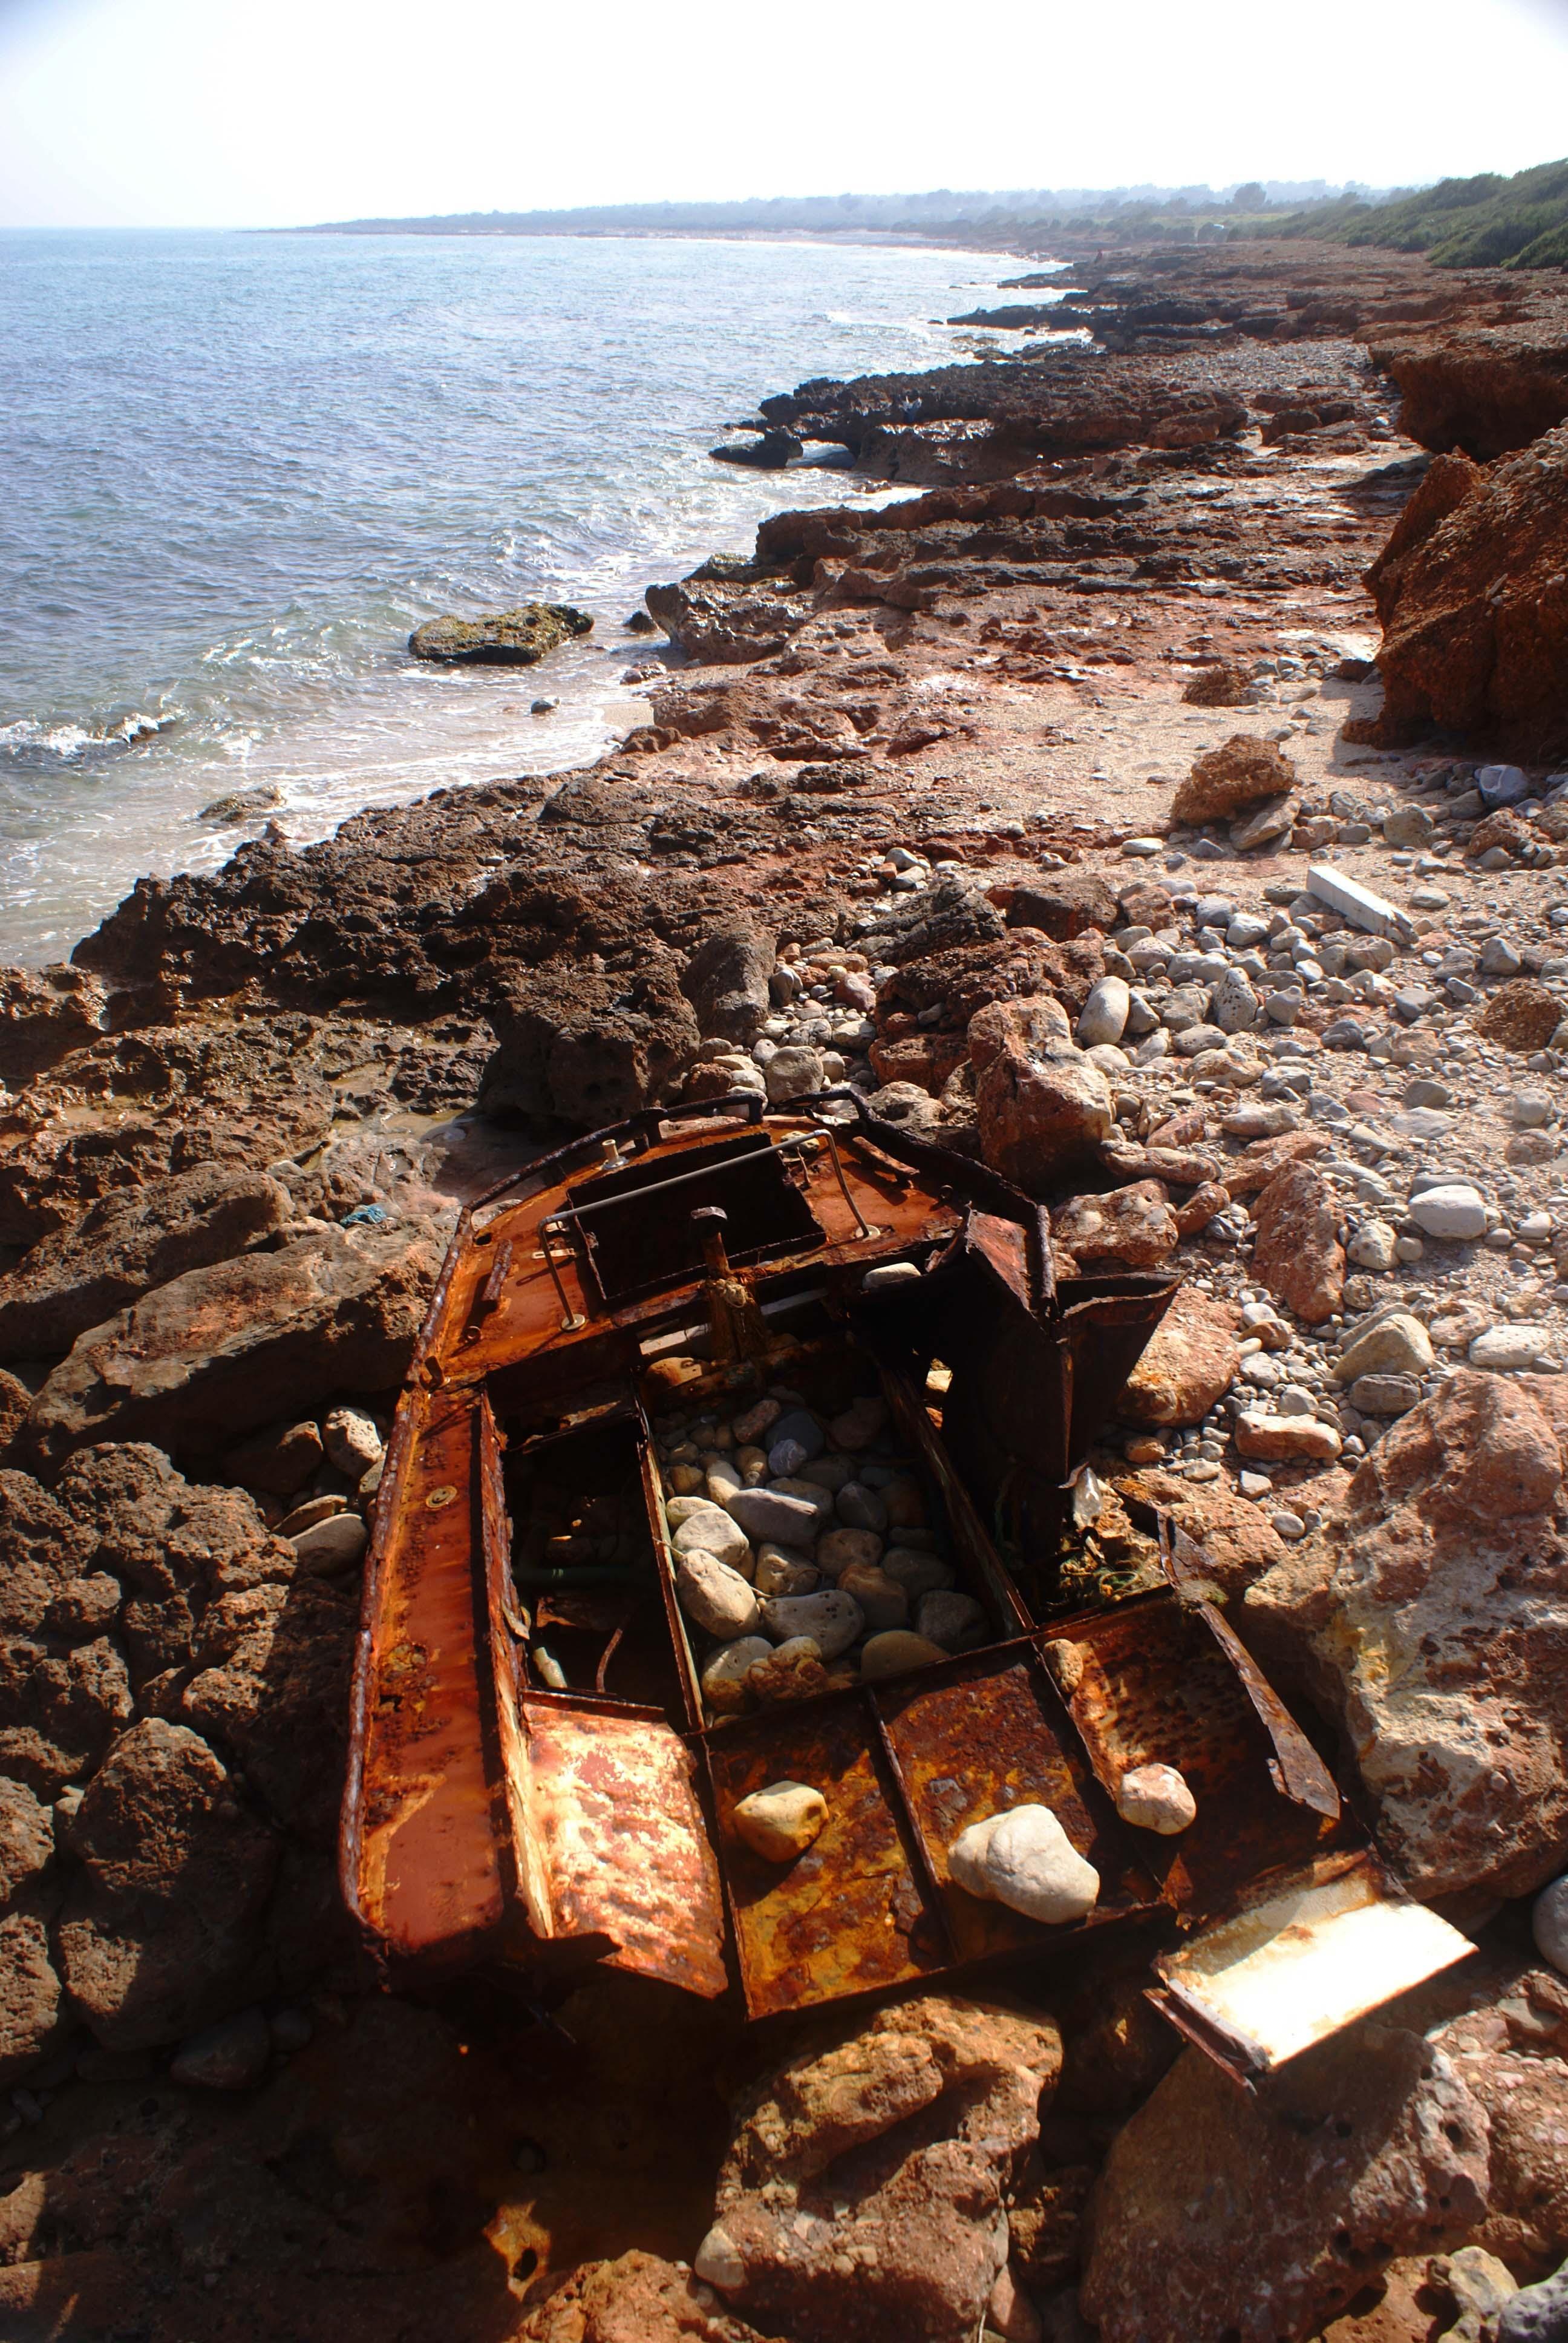 Playa Portonegro